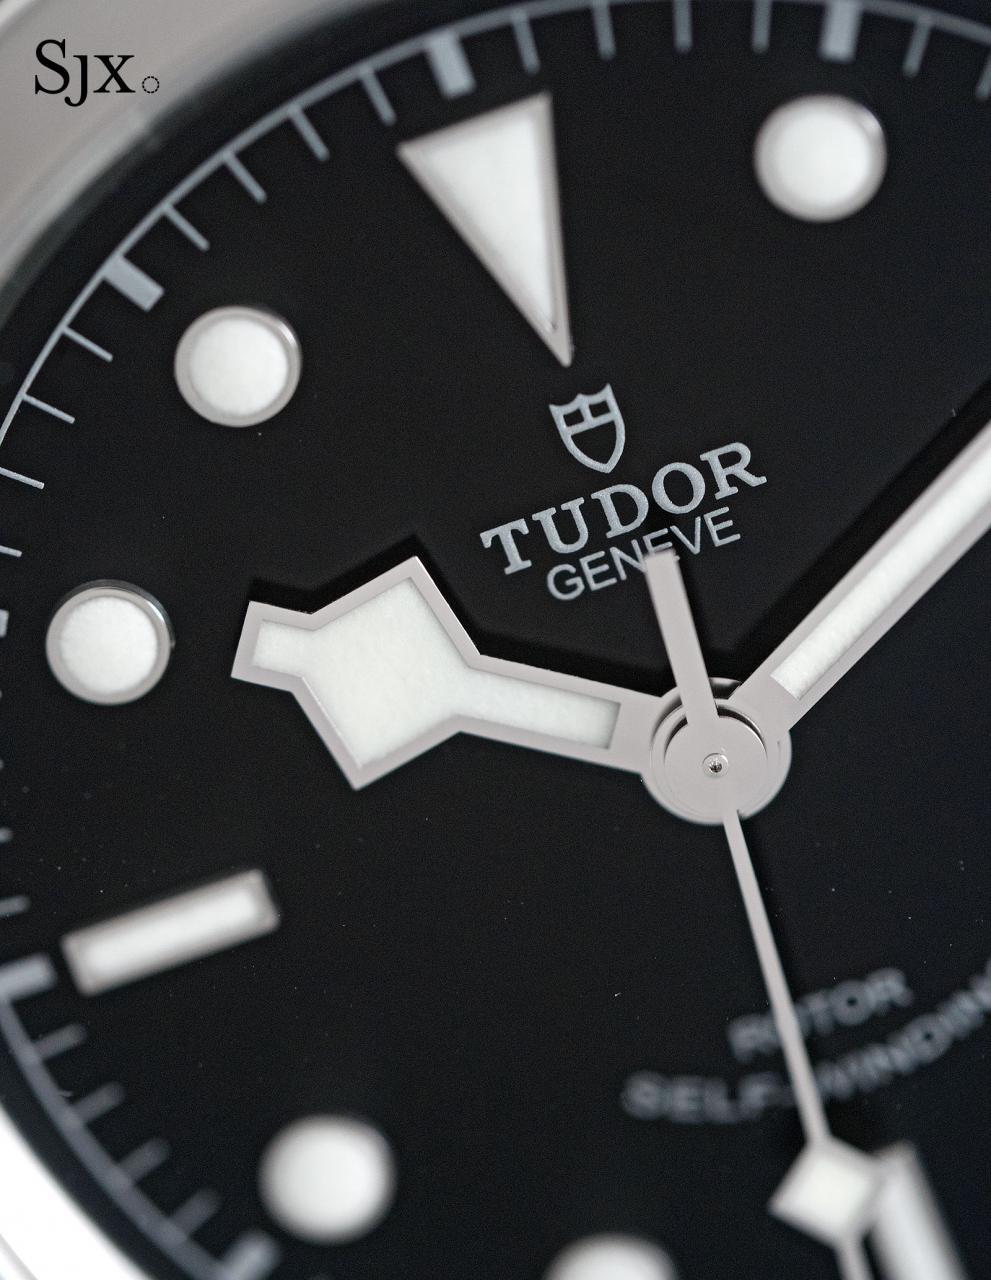 Tudor Black Bay 41-10